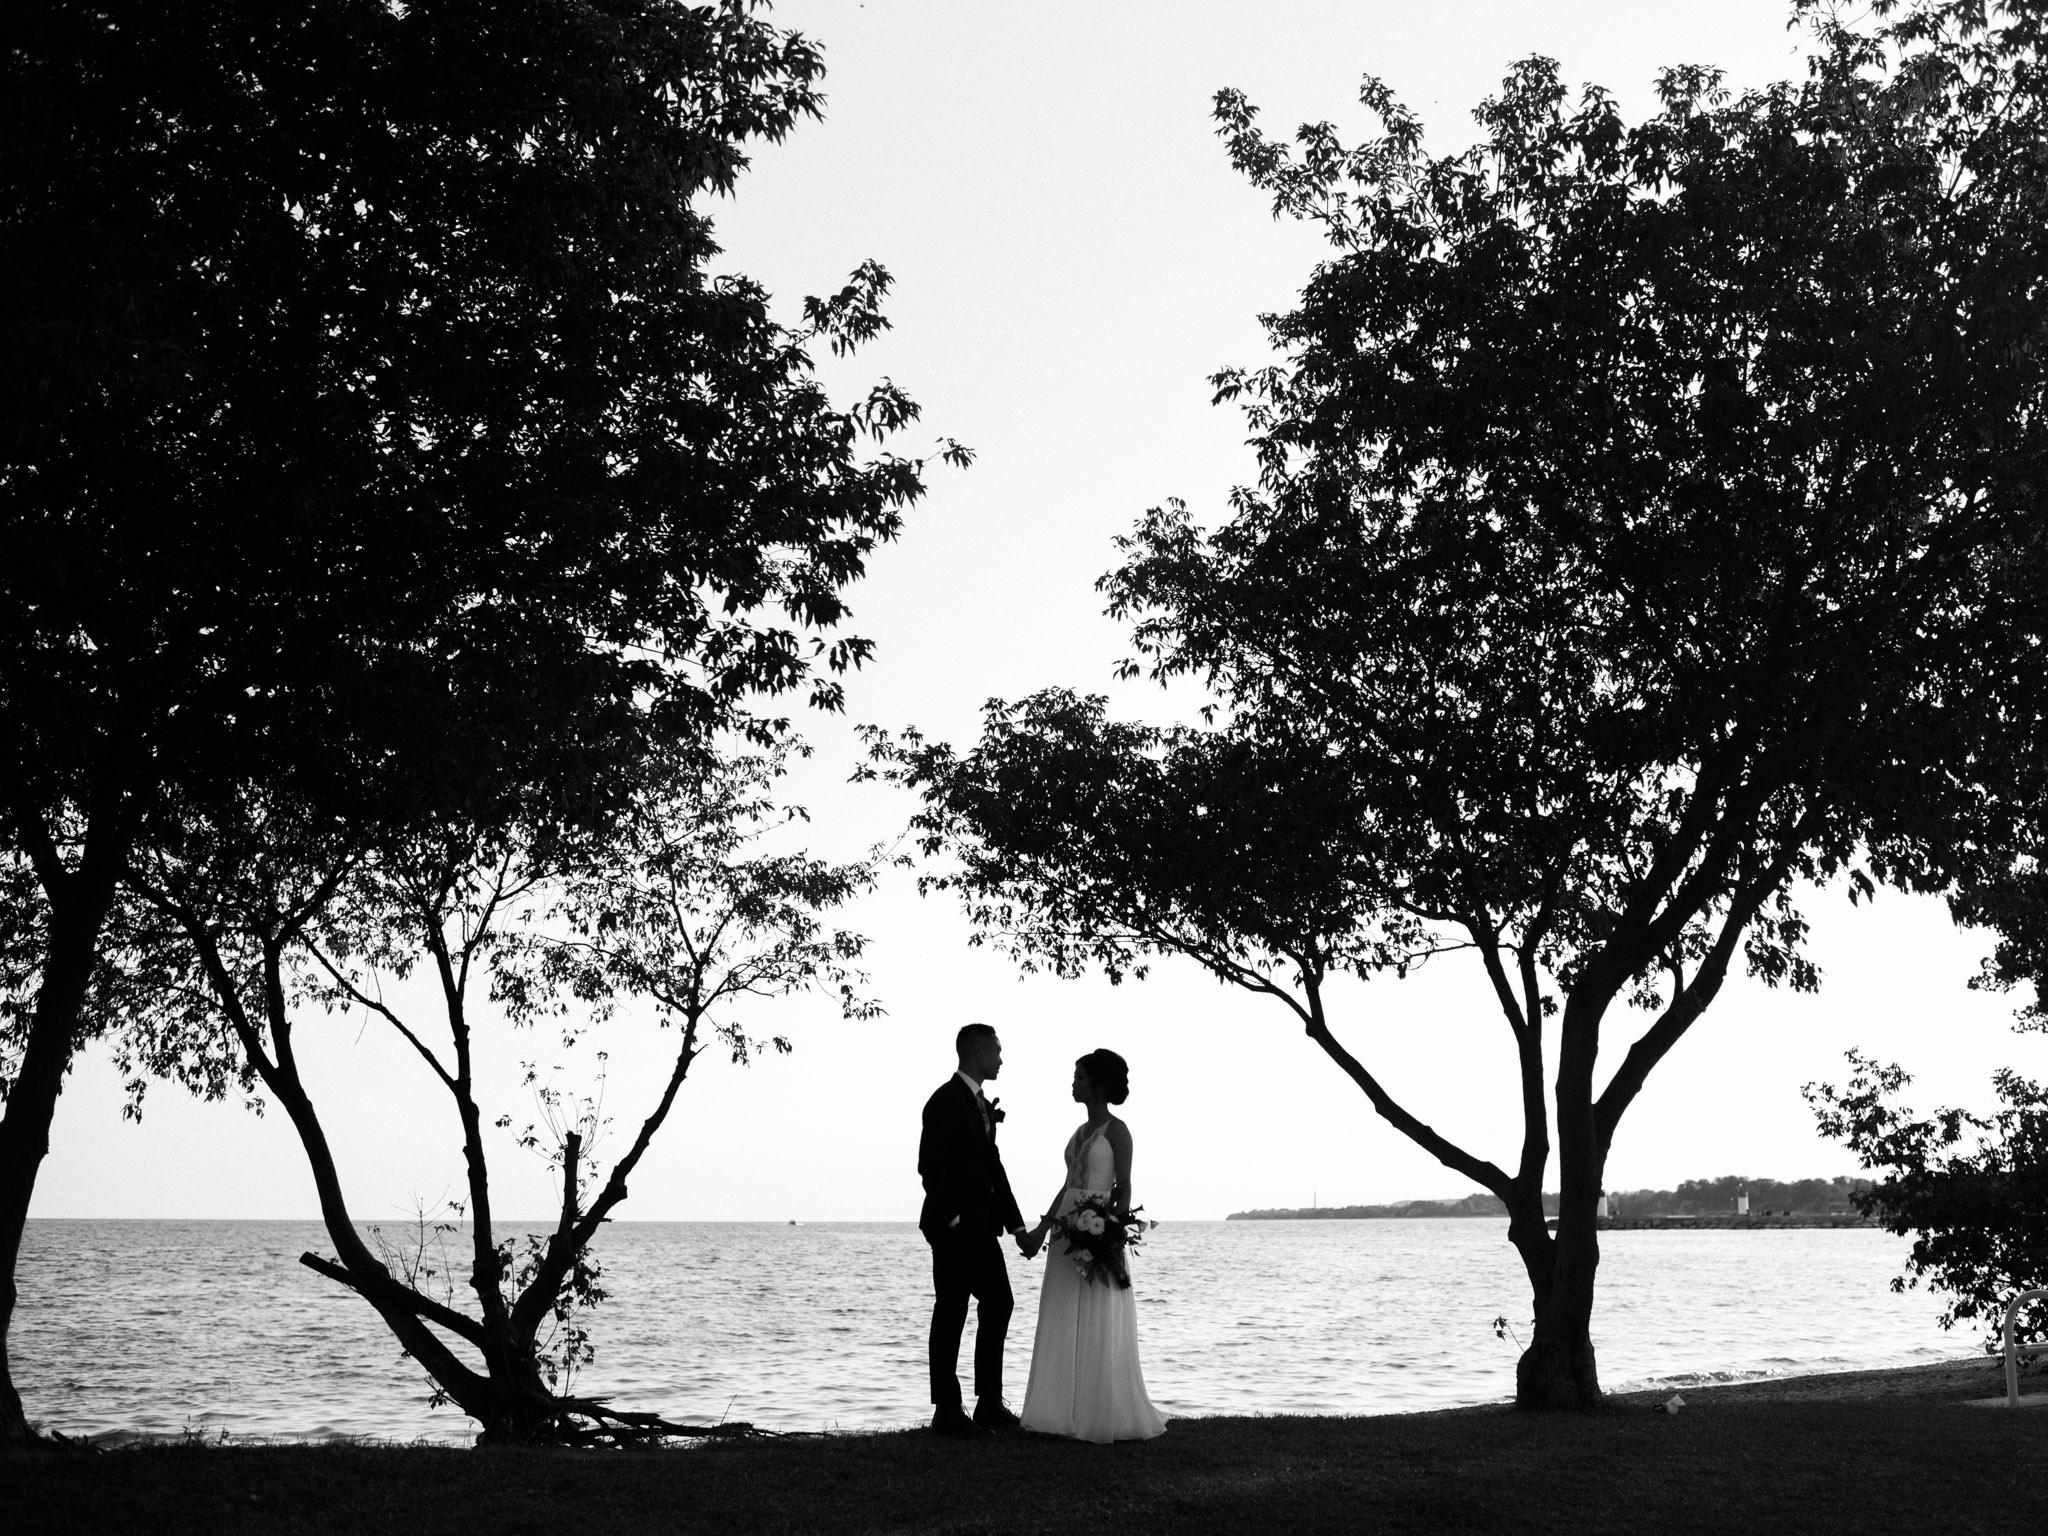 symmetrical wedding portrait at the lakefront